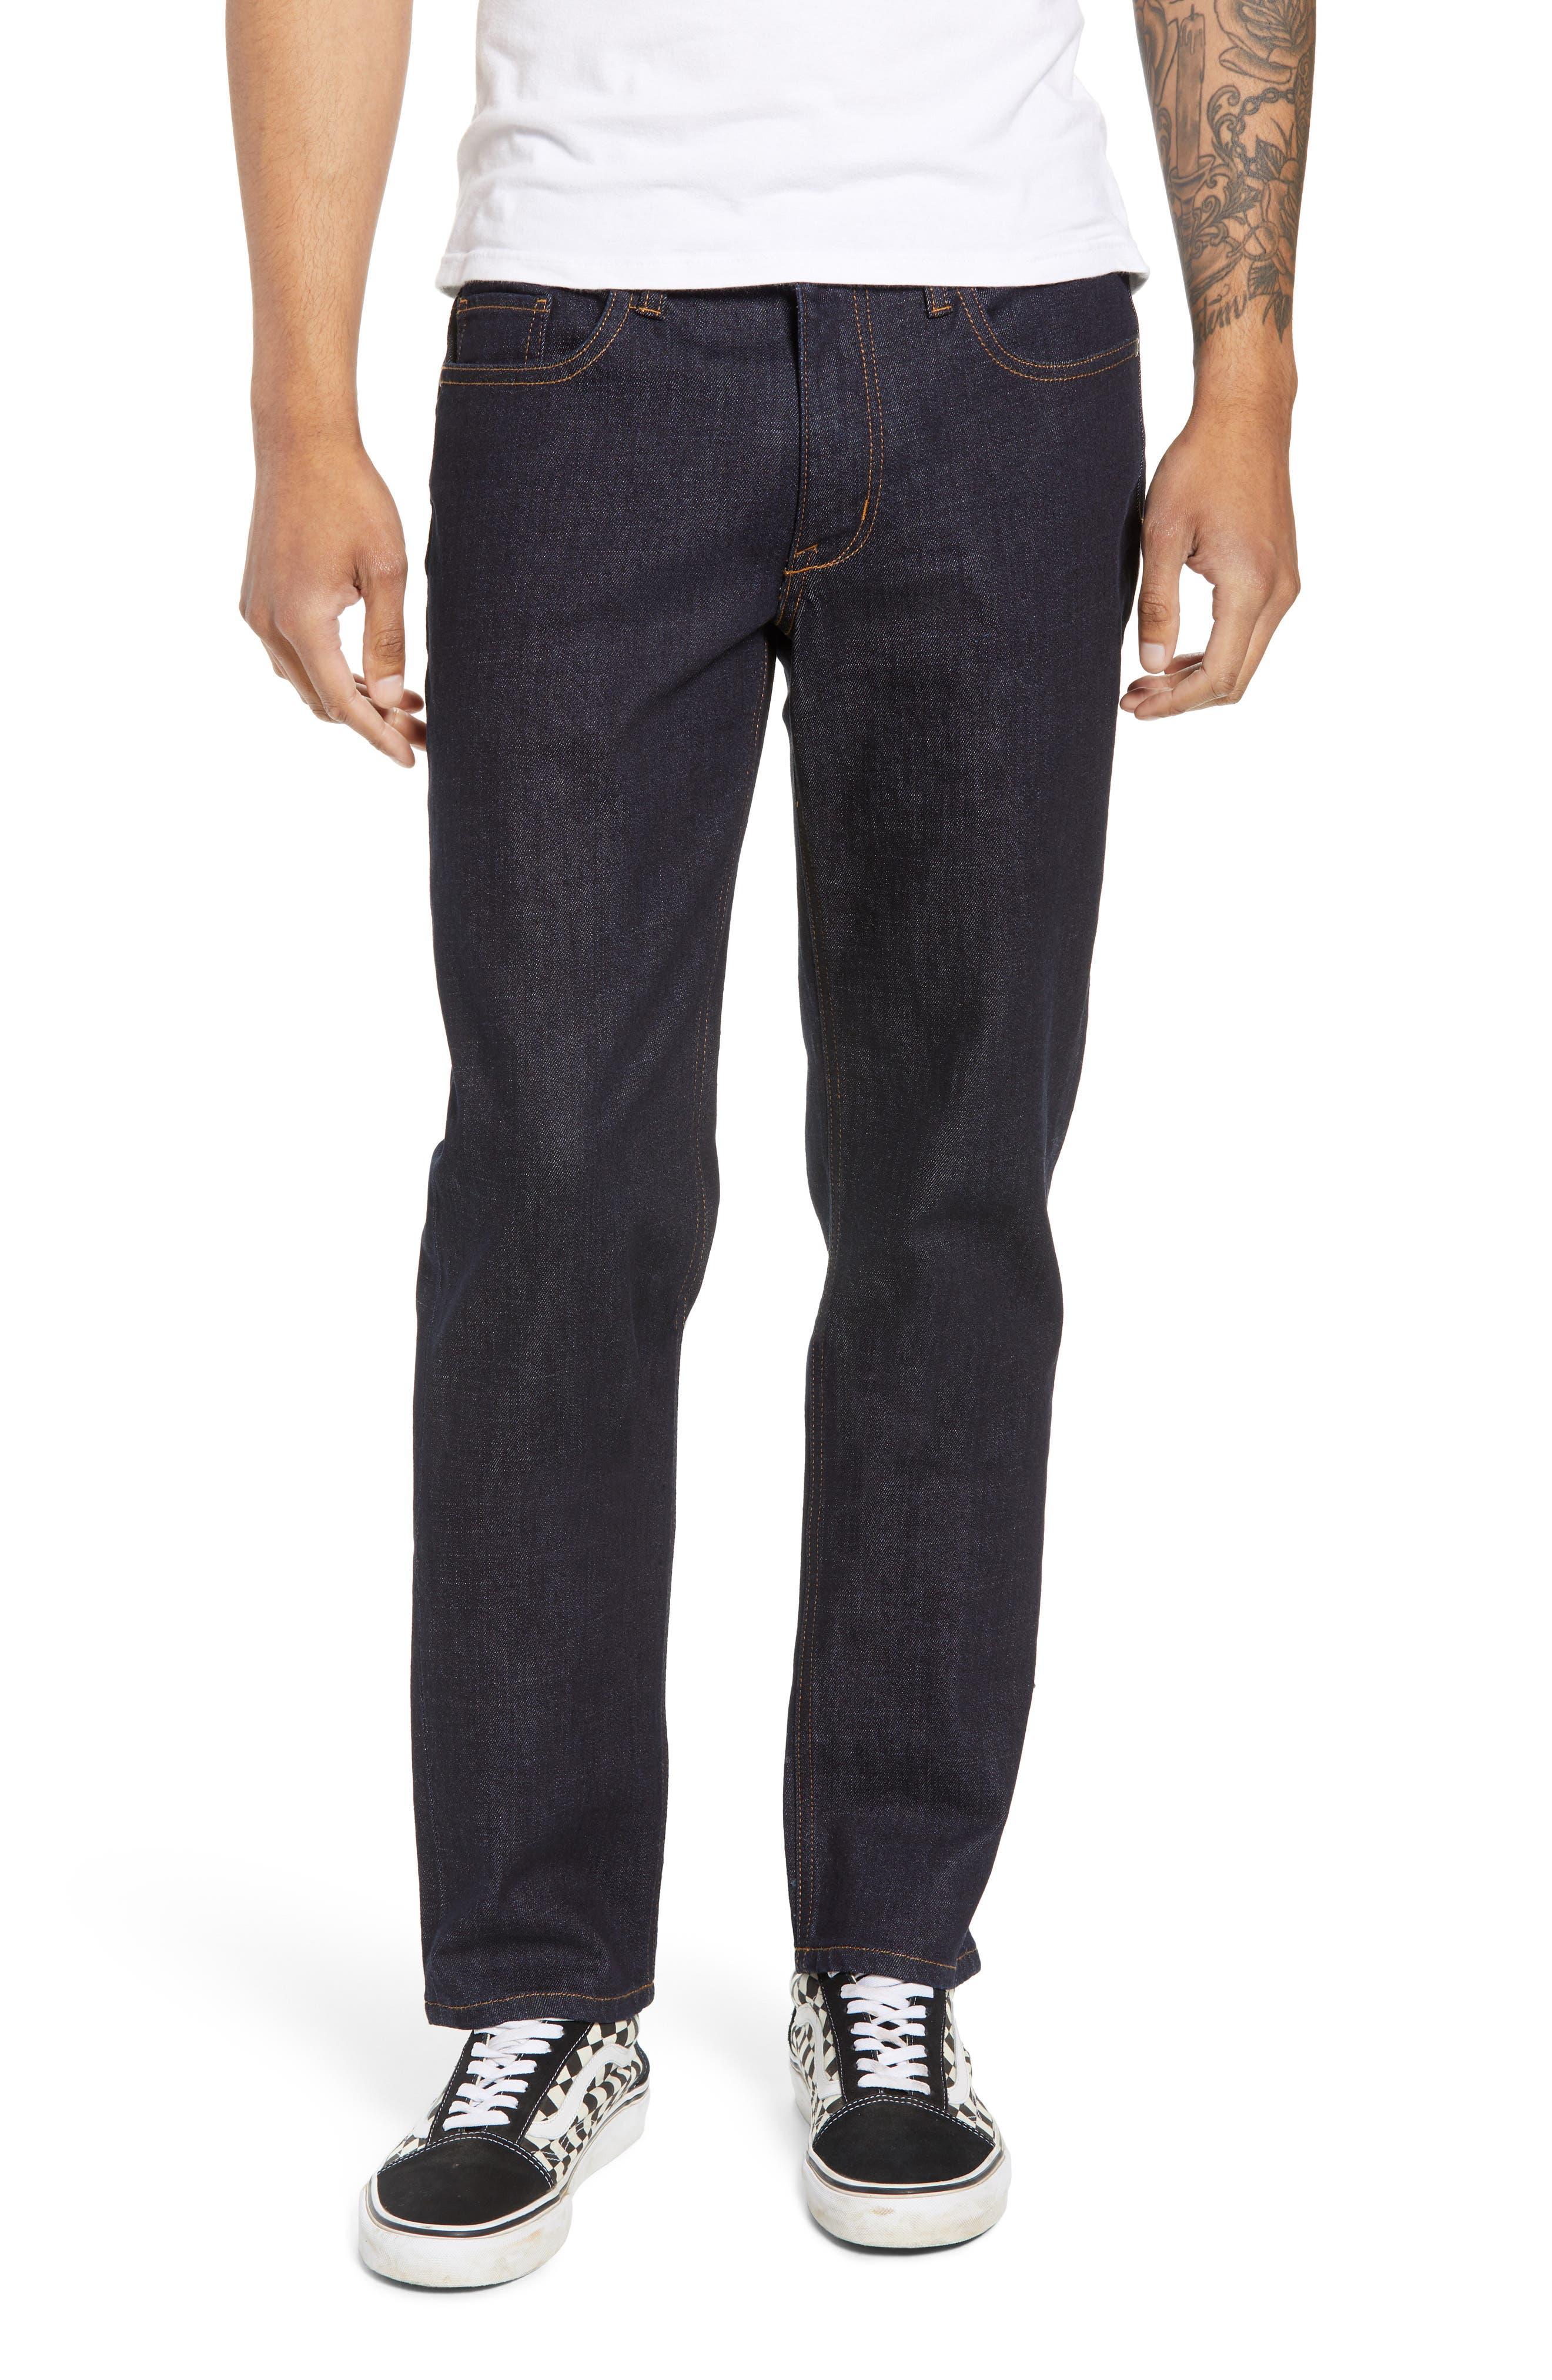 THE RAIL, Stretch Slim Leg Jeans, Main thumbnail 1, color, BLUE PERRY WASH